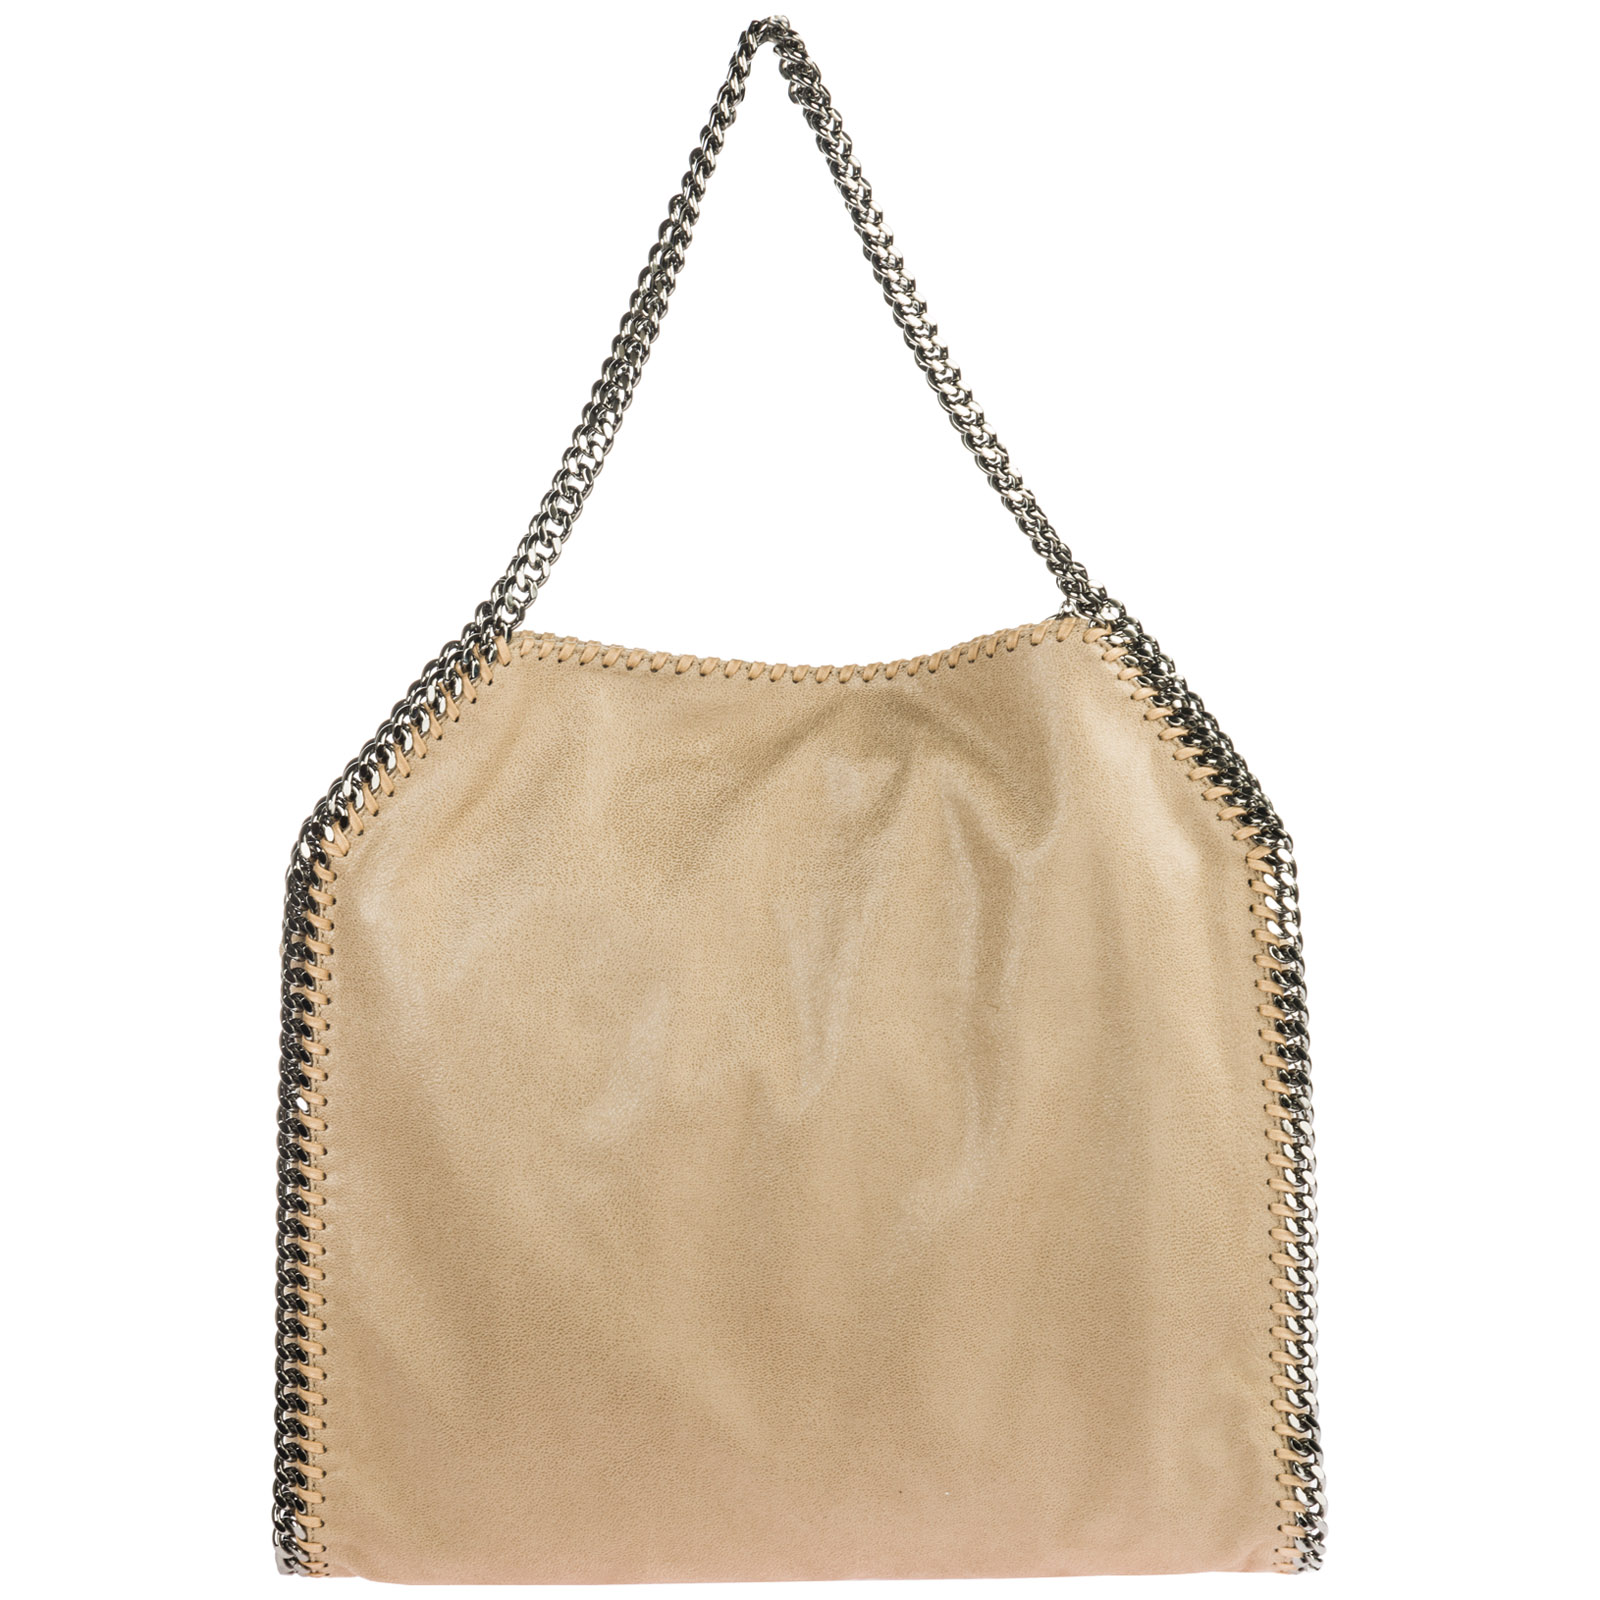 59e8869a05a49 Shoulder bag Stella Mccartney Falabella Small 261063W91329300 beige ...